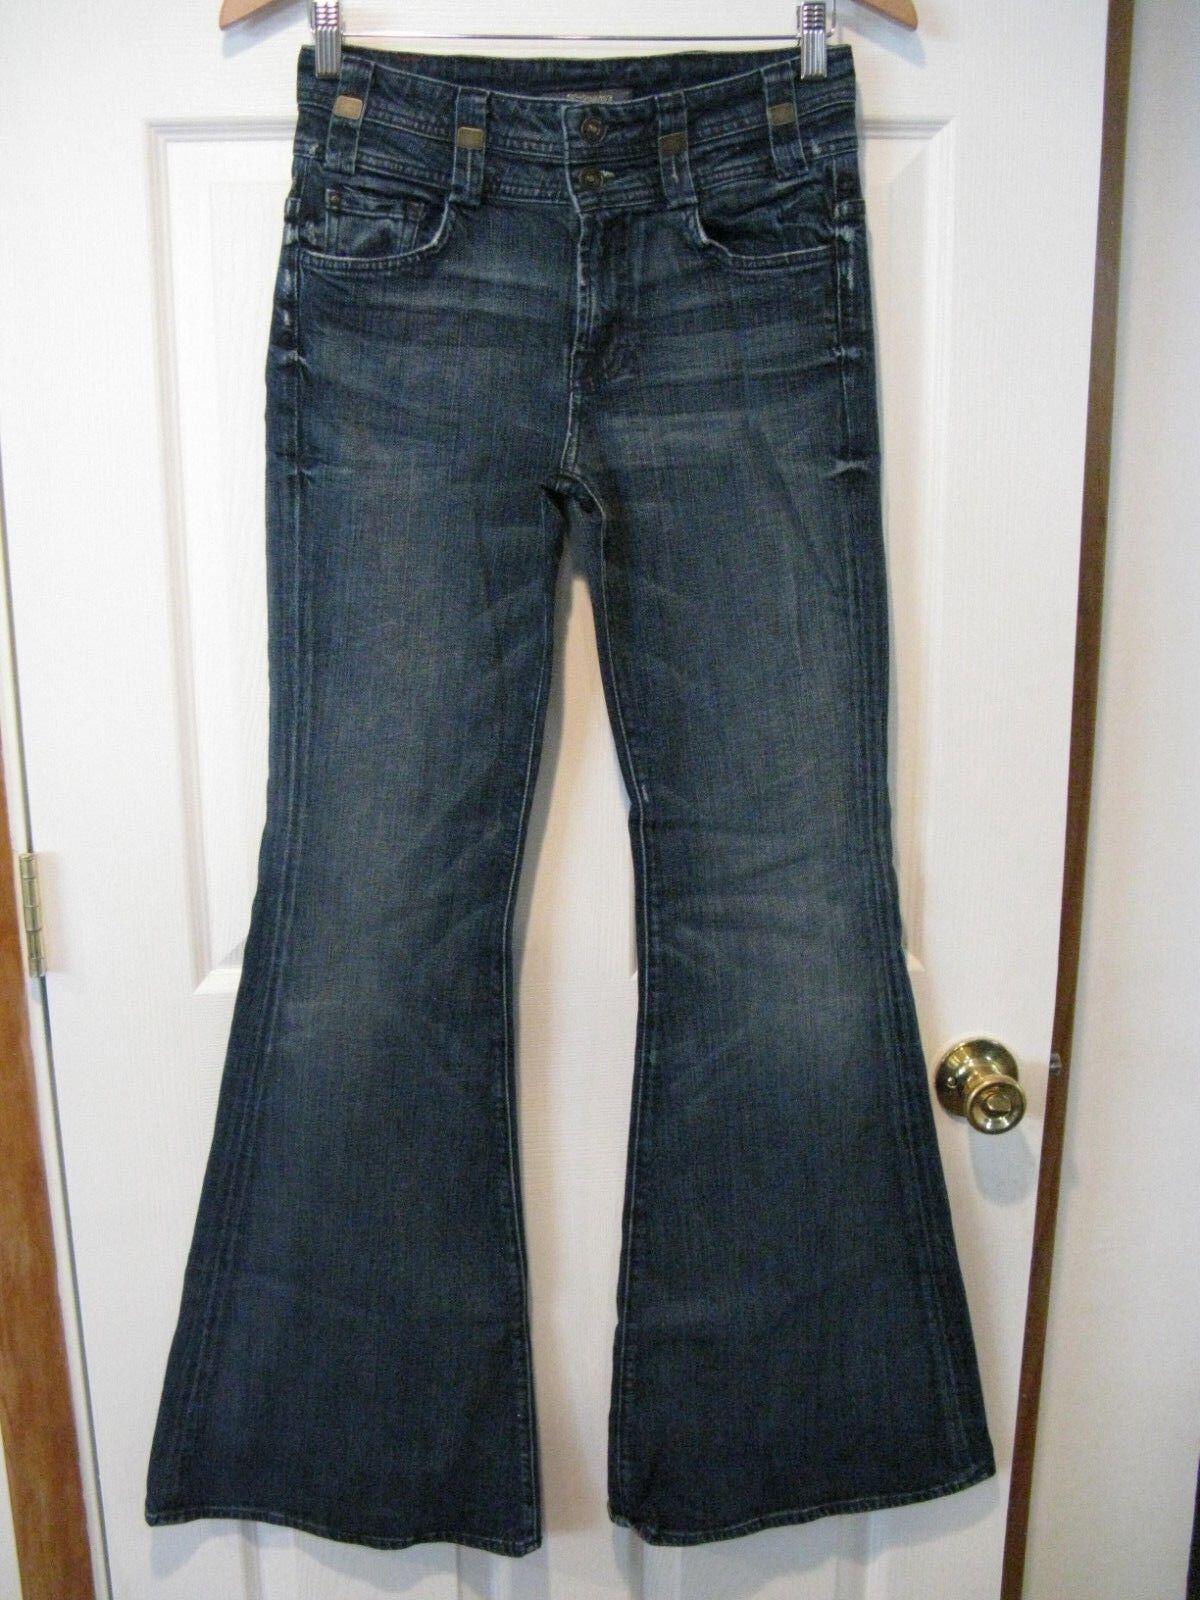 Women's SEVEN for all MANKIND jeans--size 27--Inseam 34--EUC